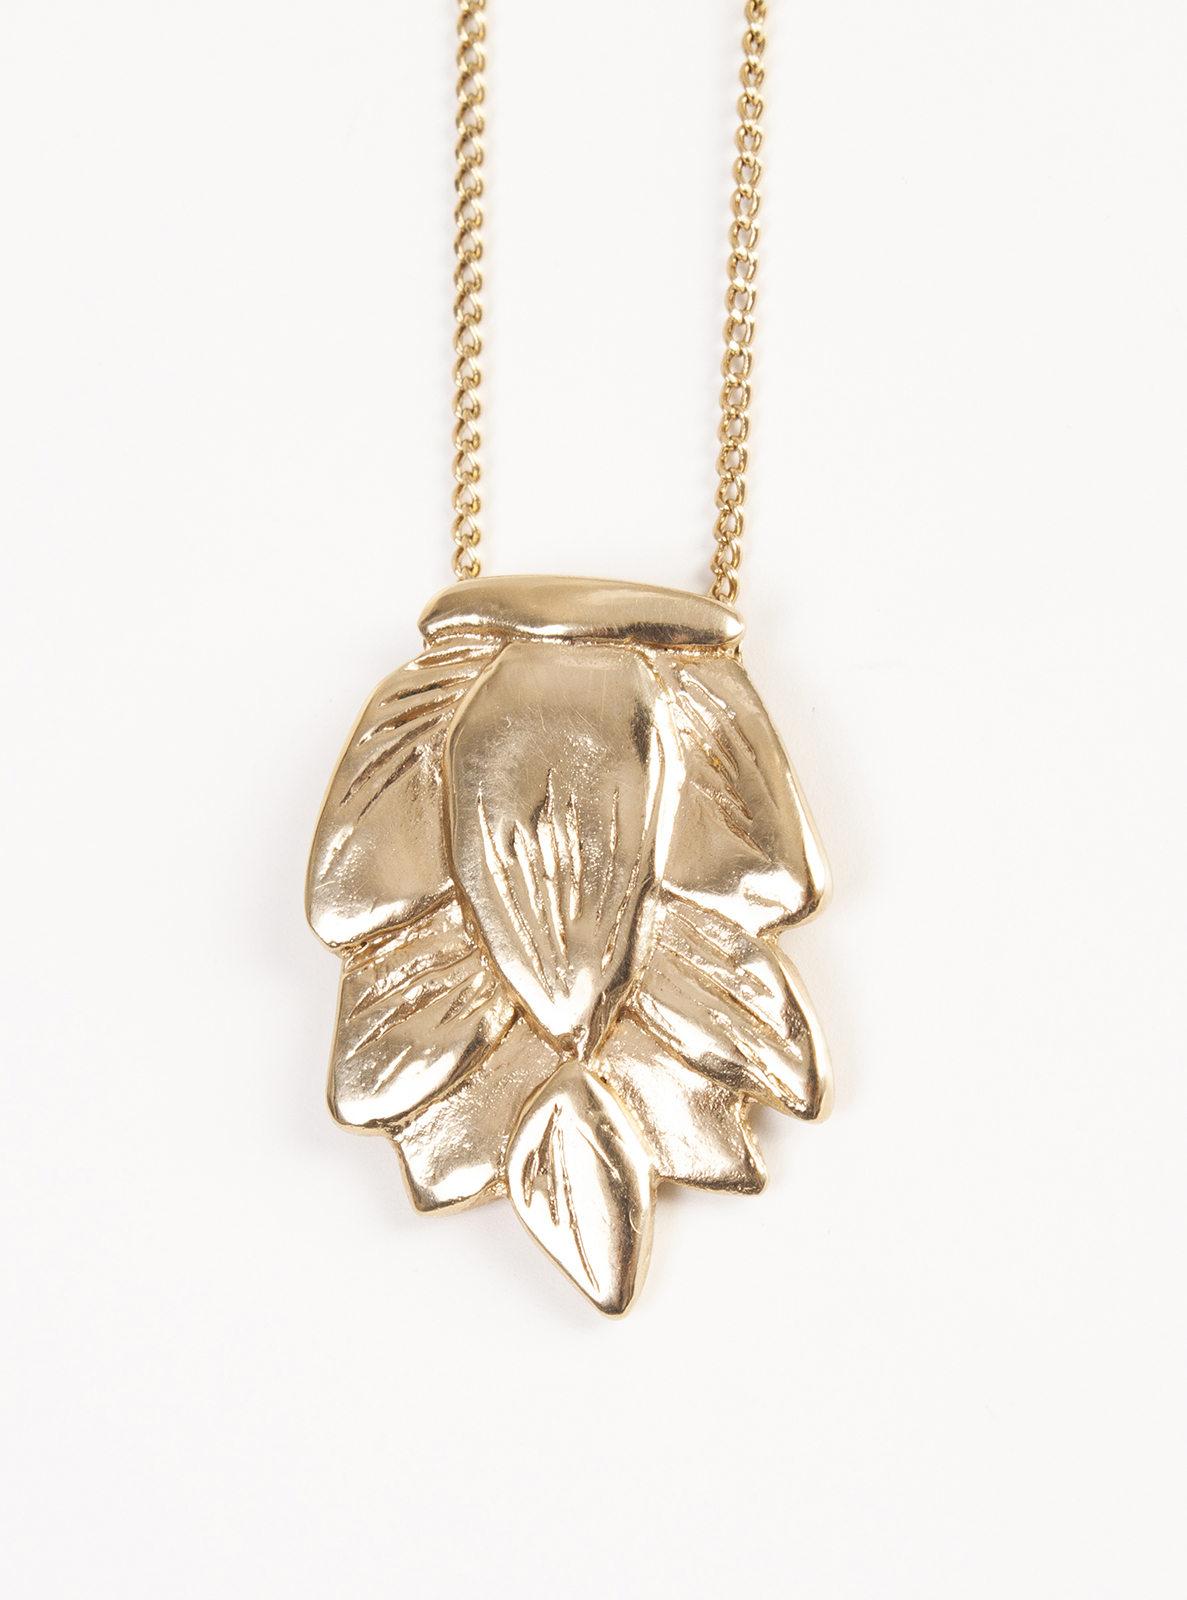 Celine-Lareynie-bijoux-joaillerie-ethique-collier-guzmania-gros-